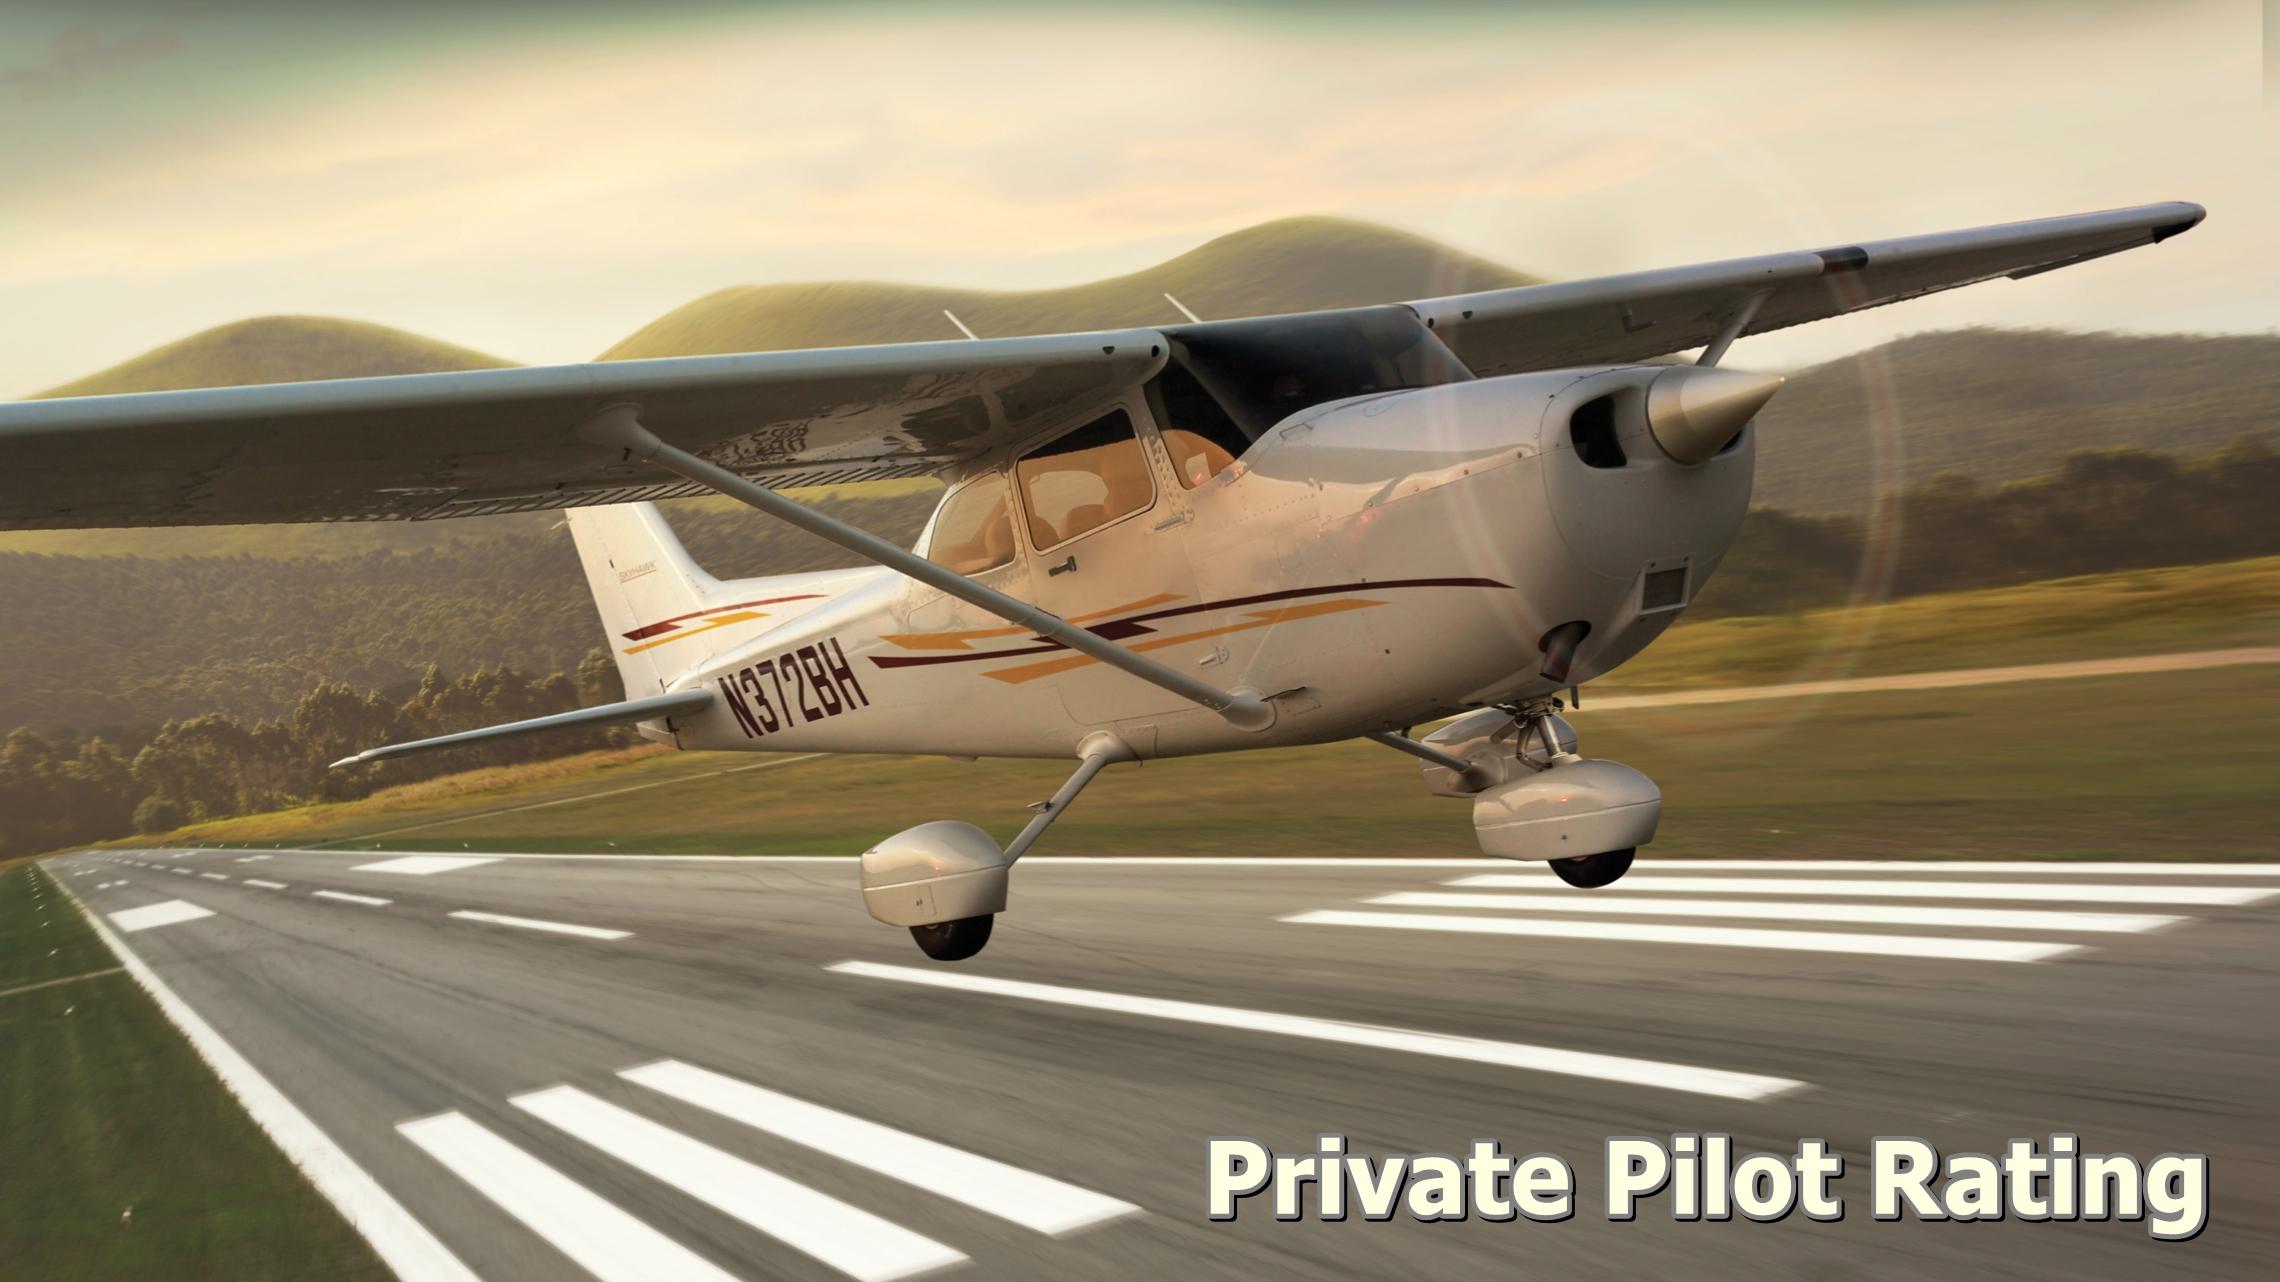 Private Pilot Media